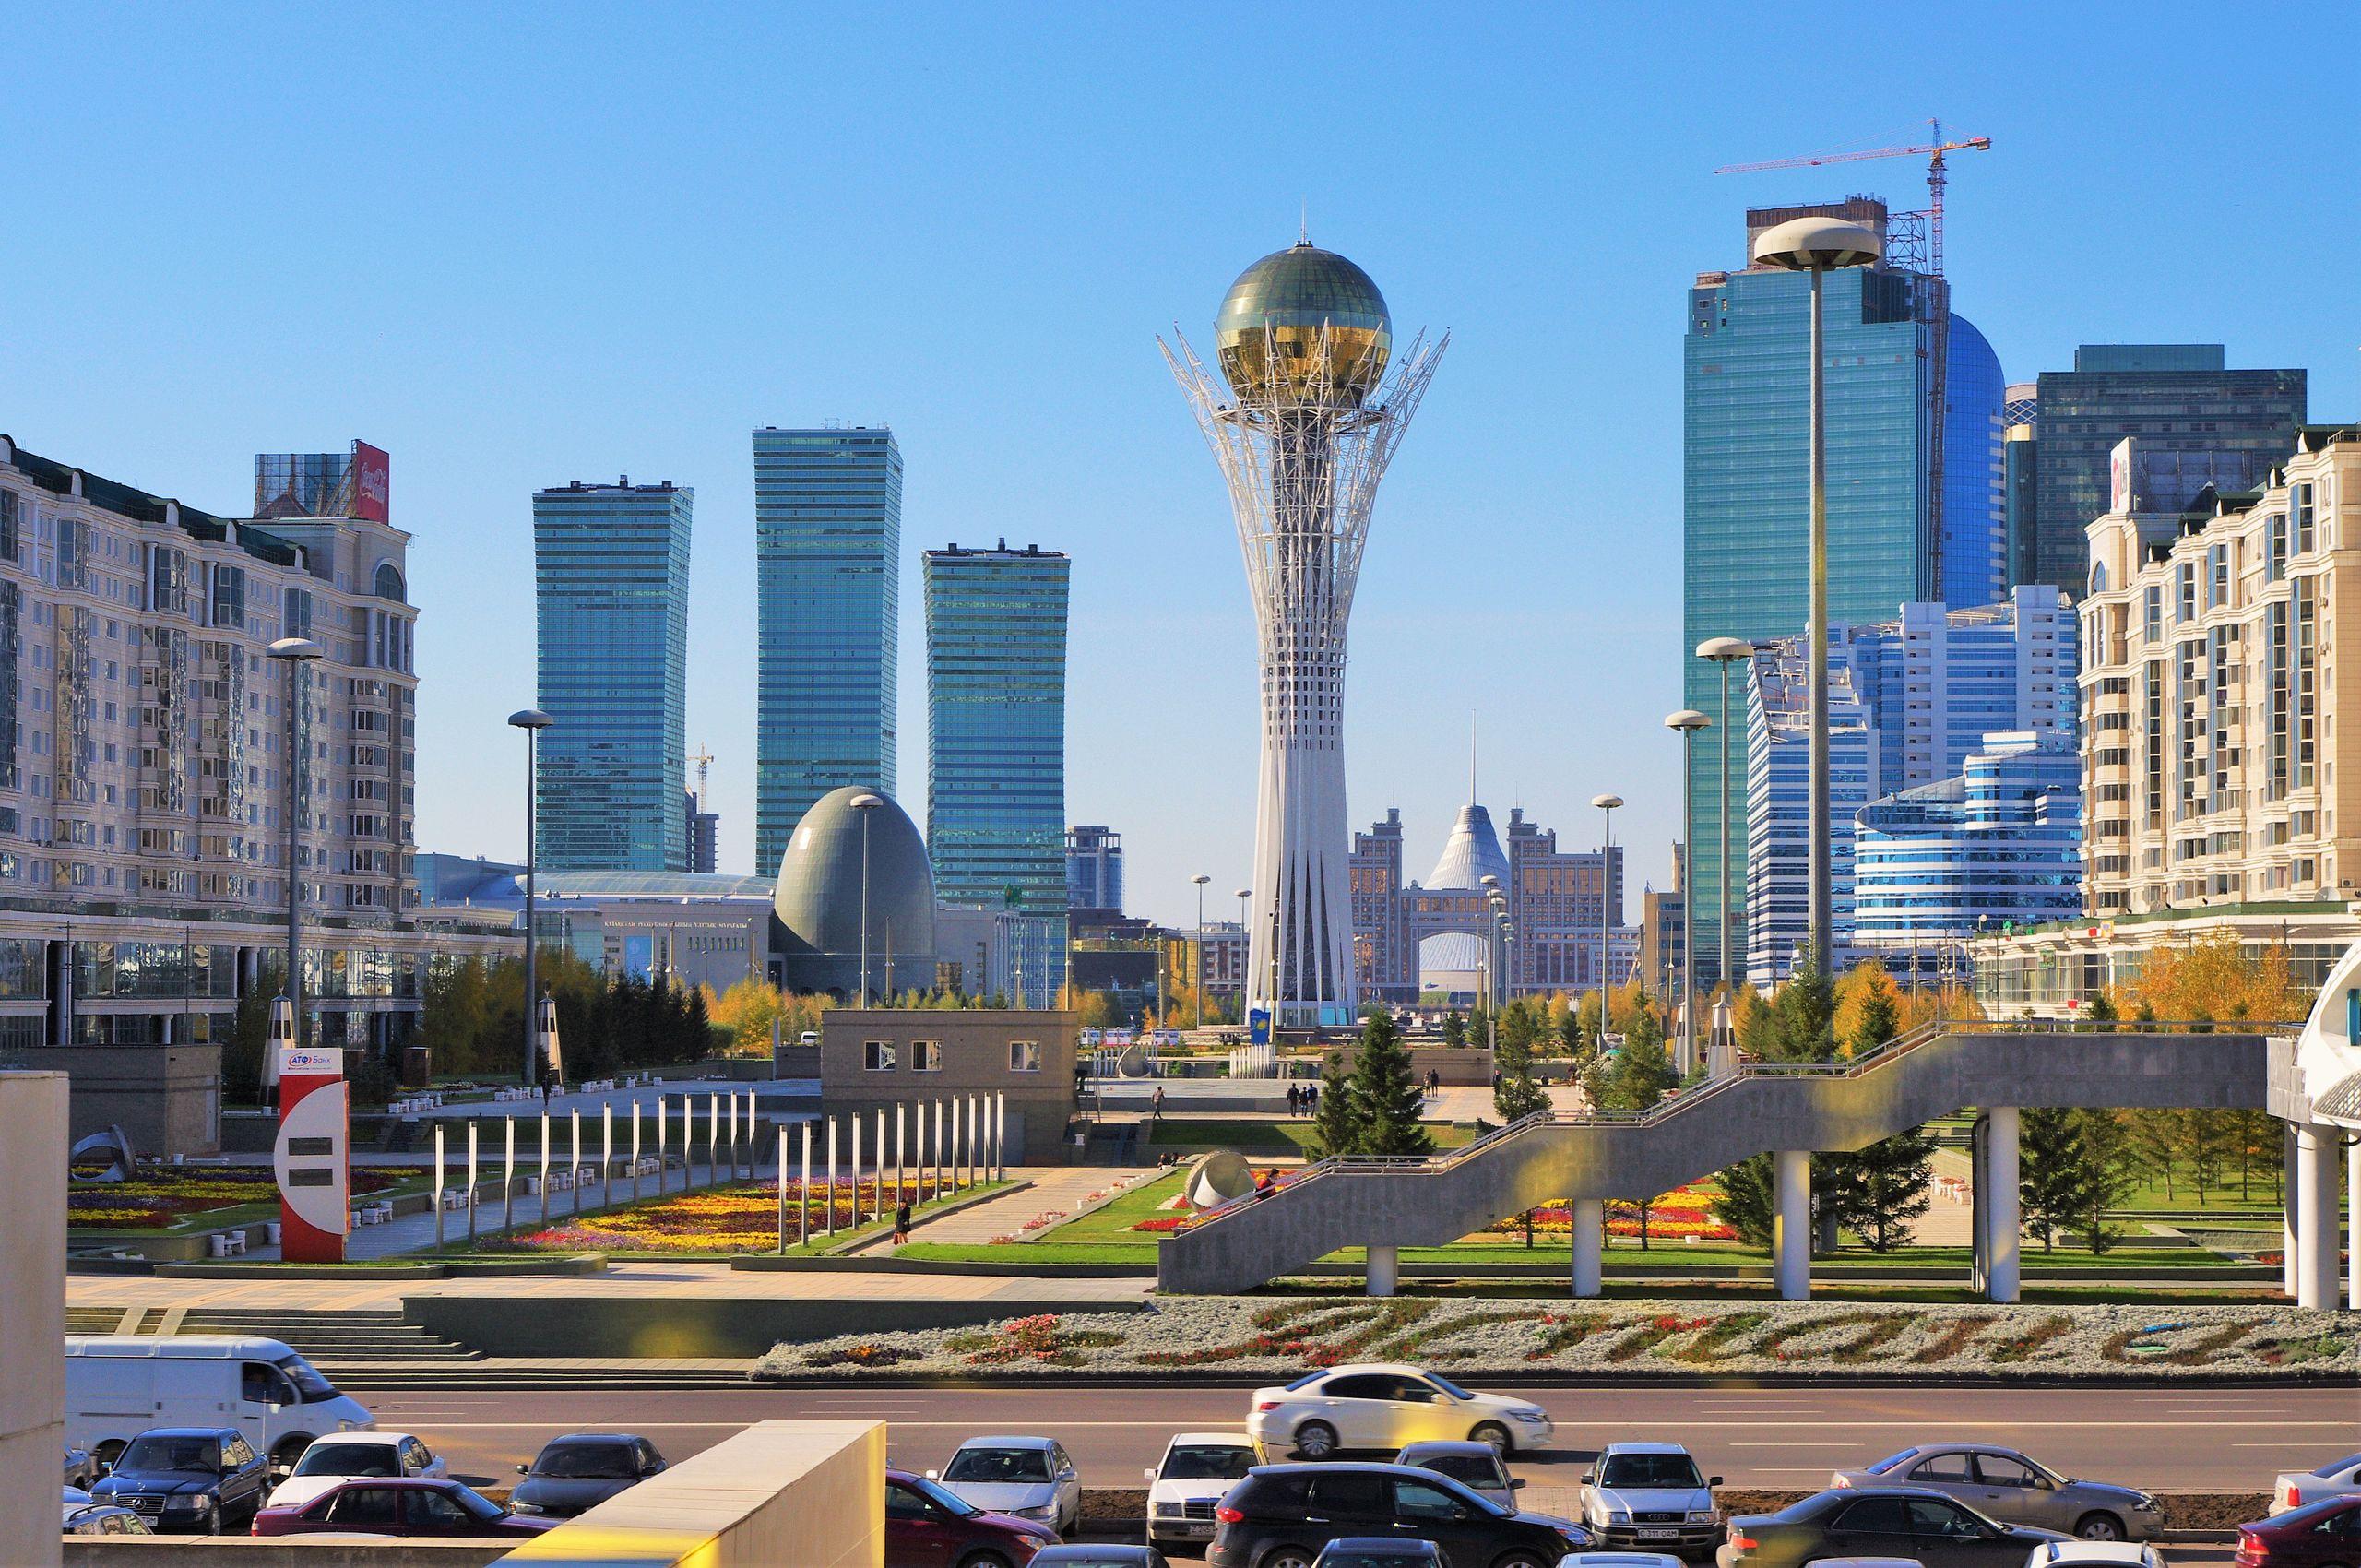 Downtown Astana Kazachstan